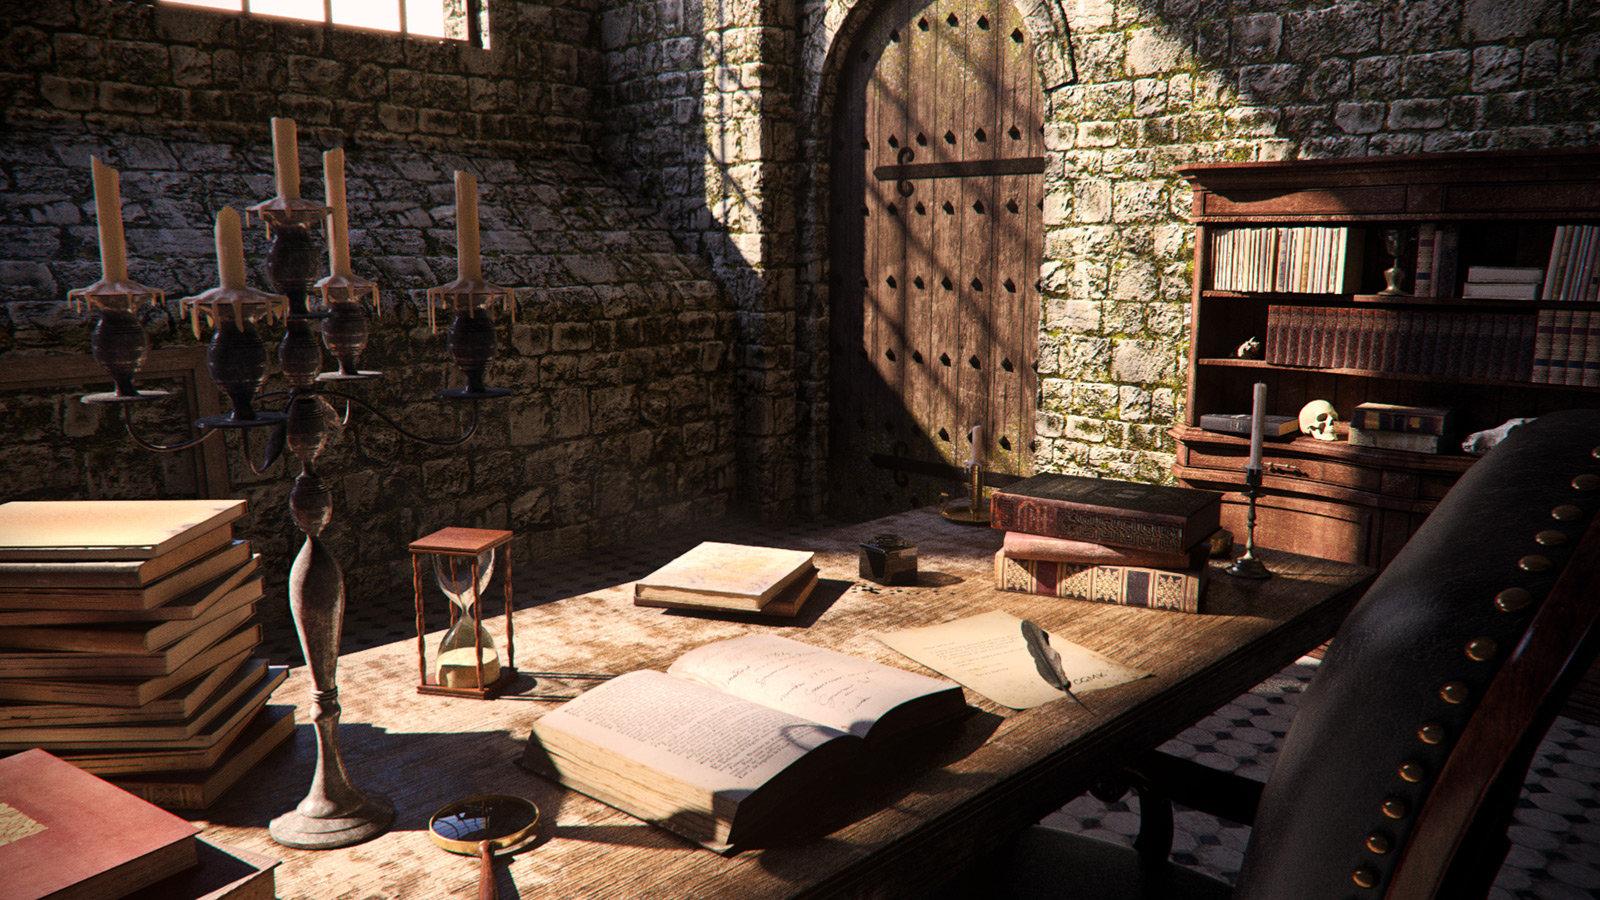 Medieval interior day 11 pn pp